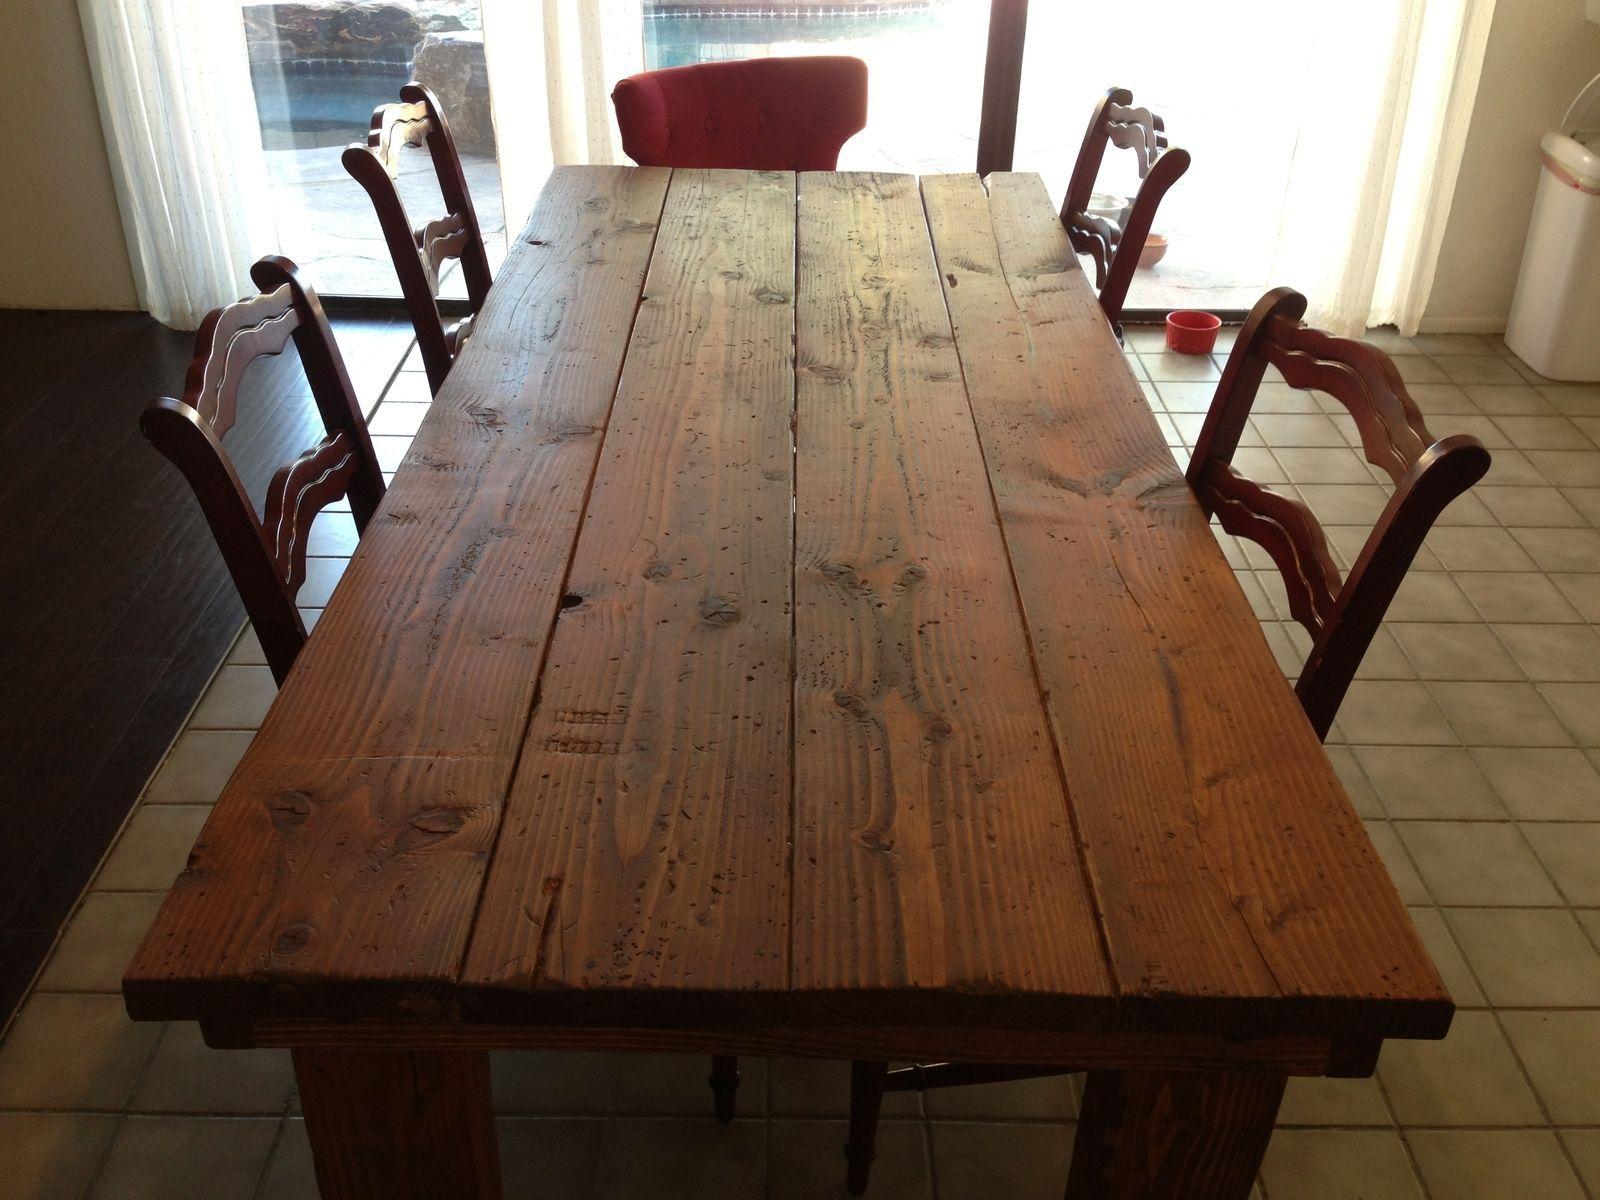 Rustic Farmhouse Dining Table Farmhouse Dining Table Rustic